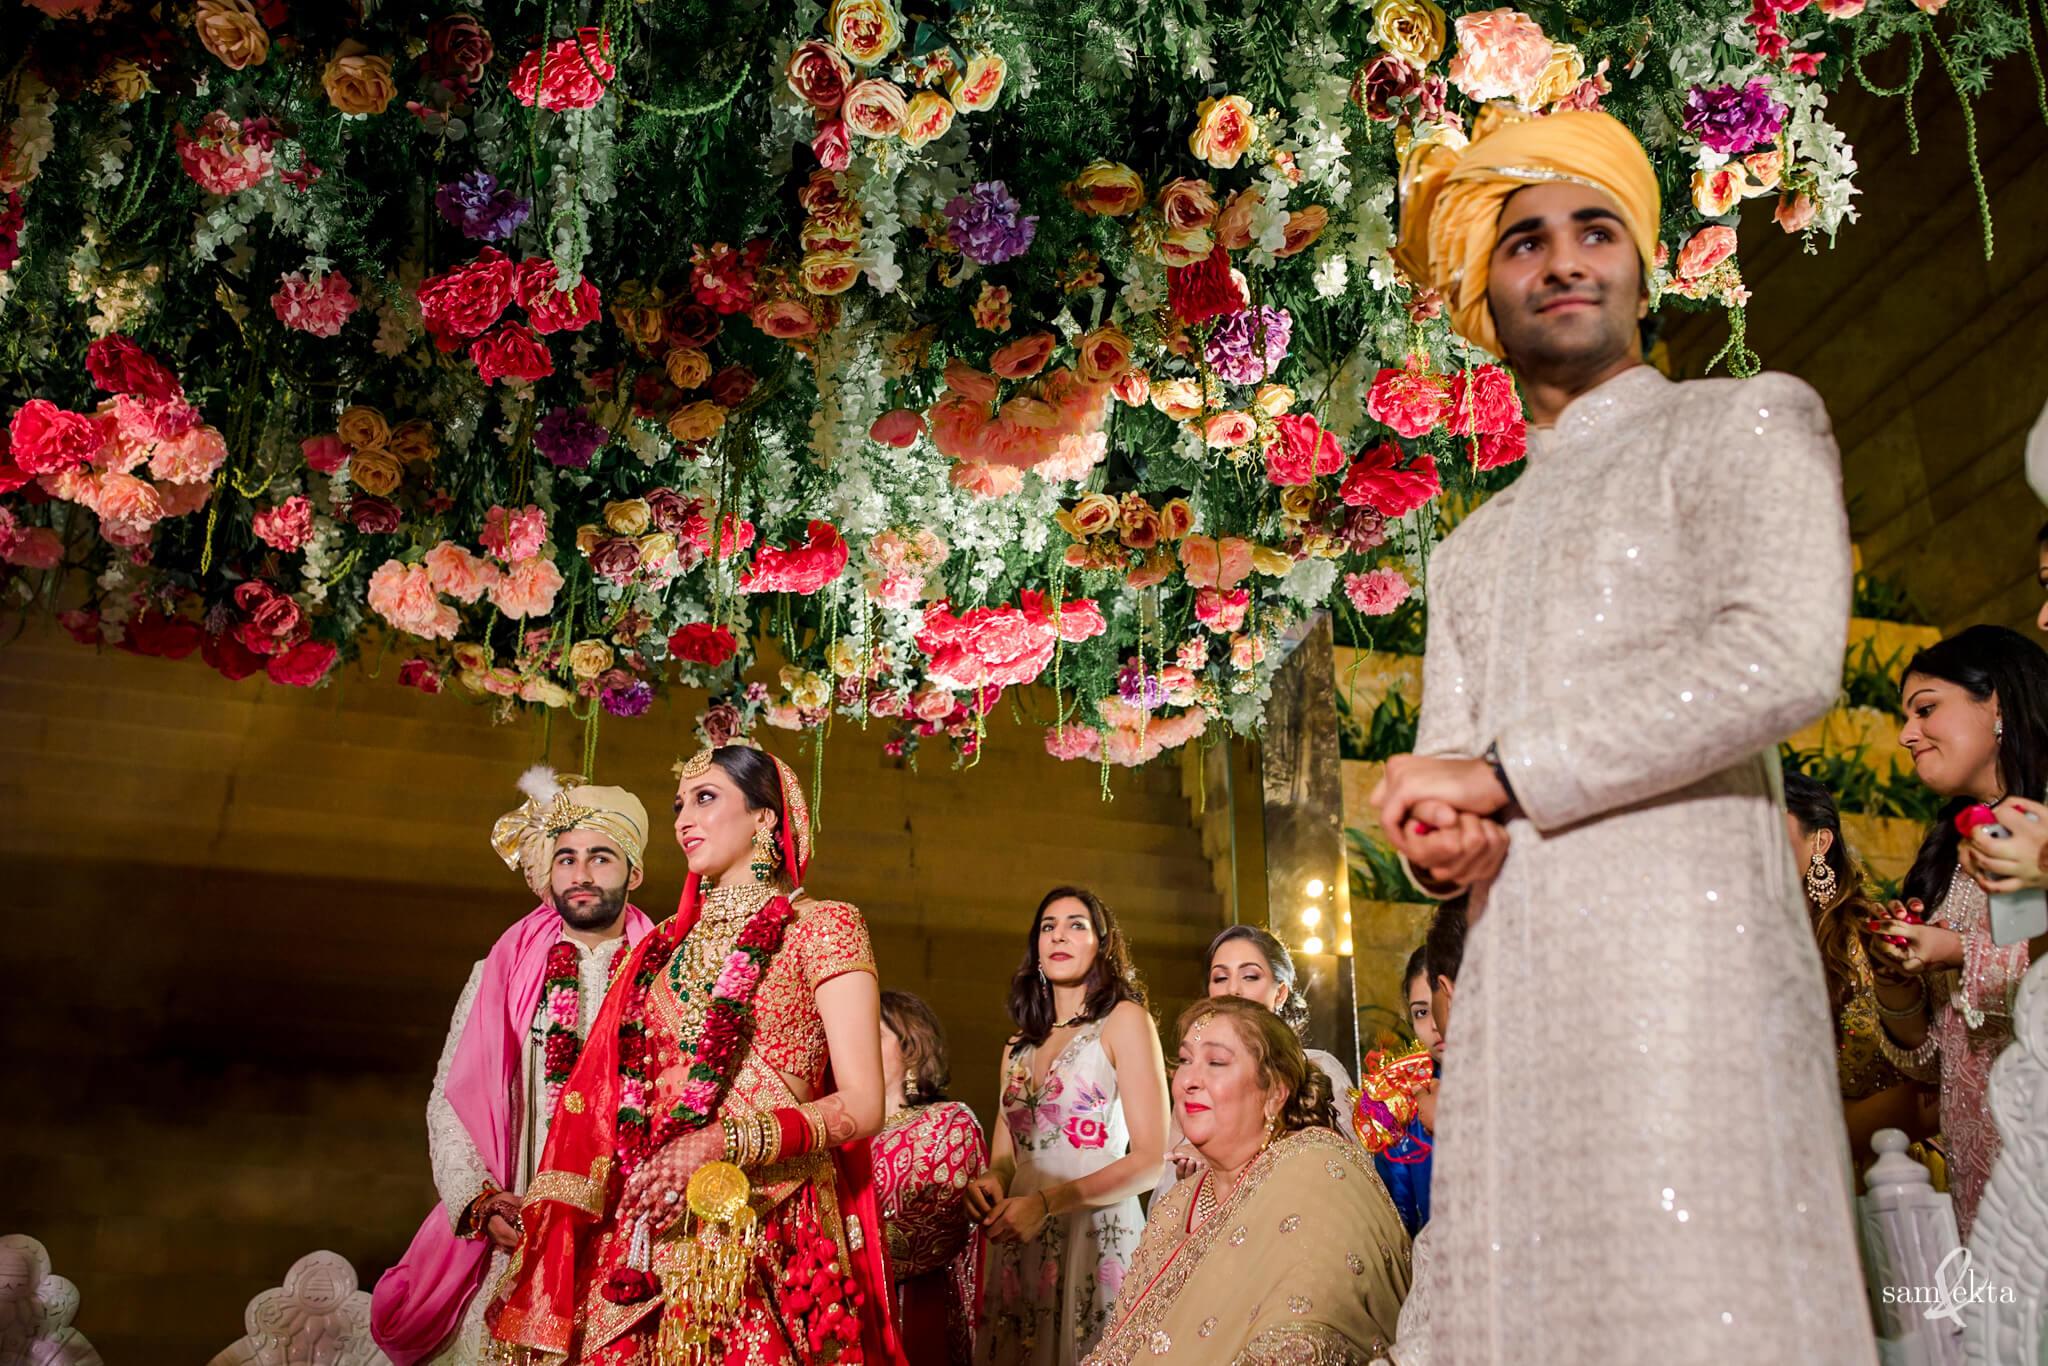 wedding decor, Armaan Jain And Anissa Malhotra's Wedding